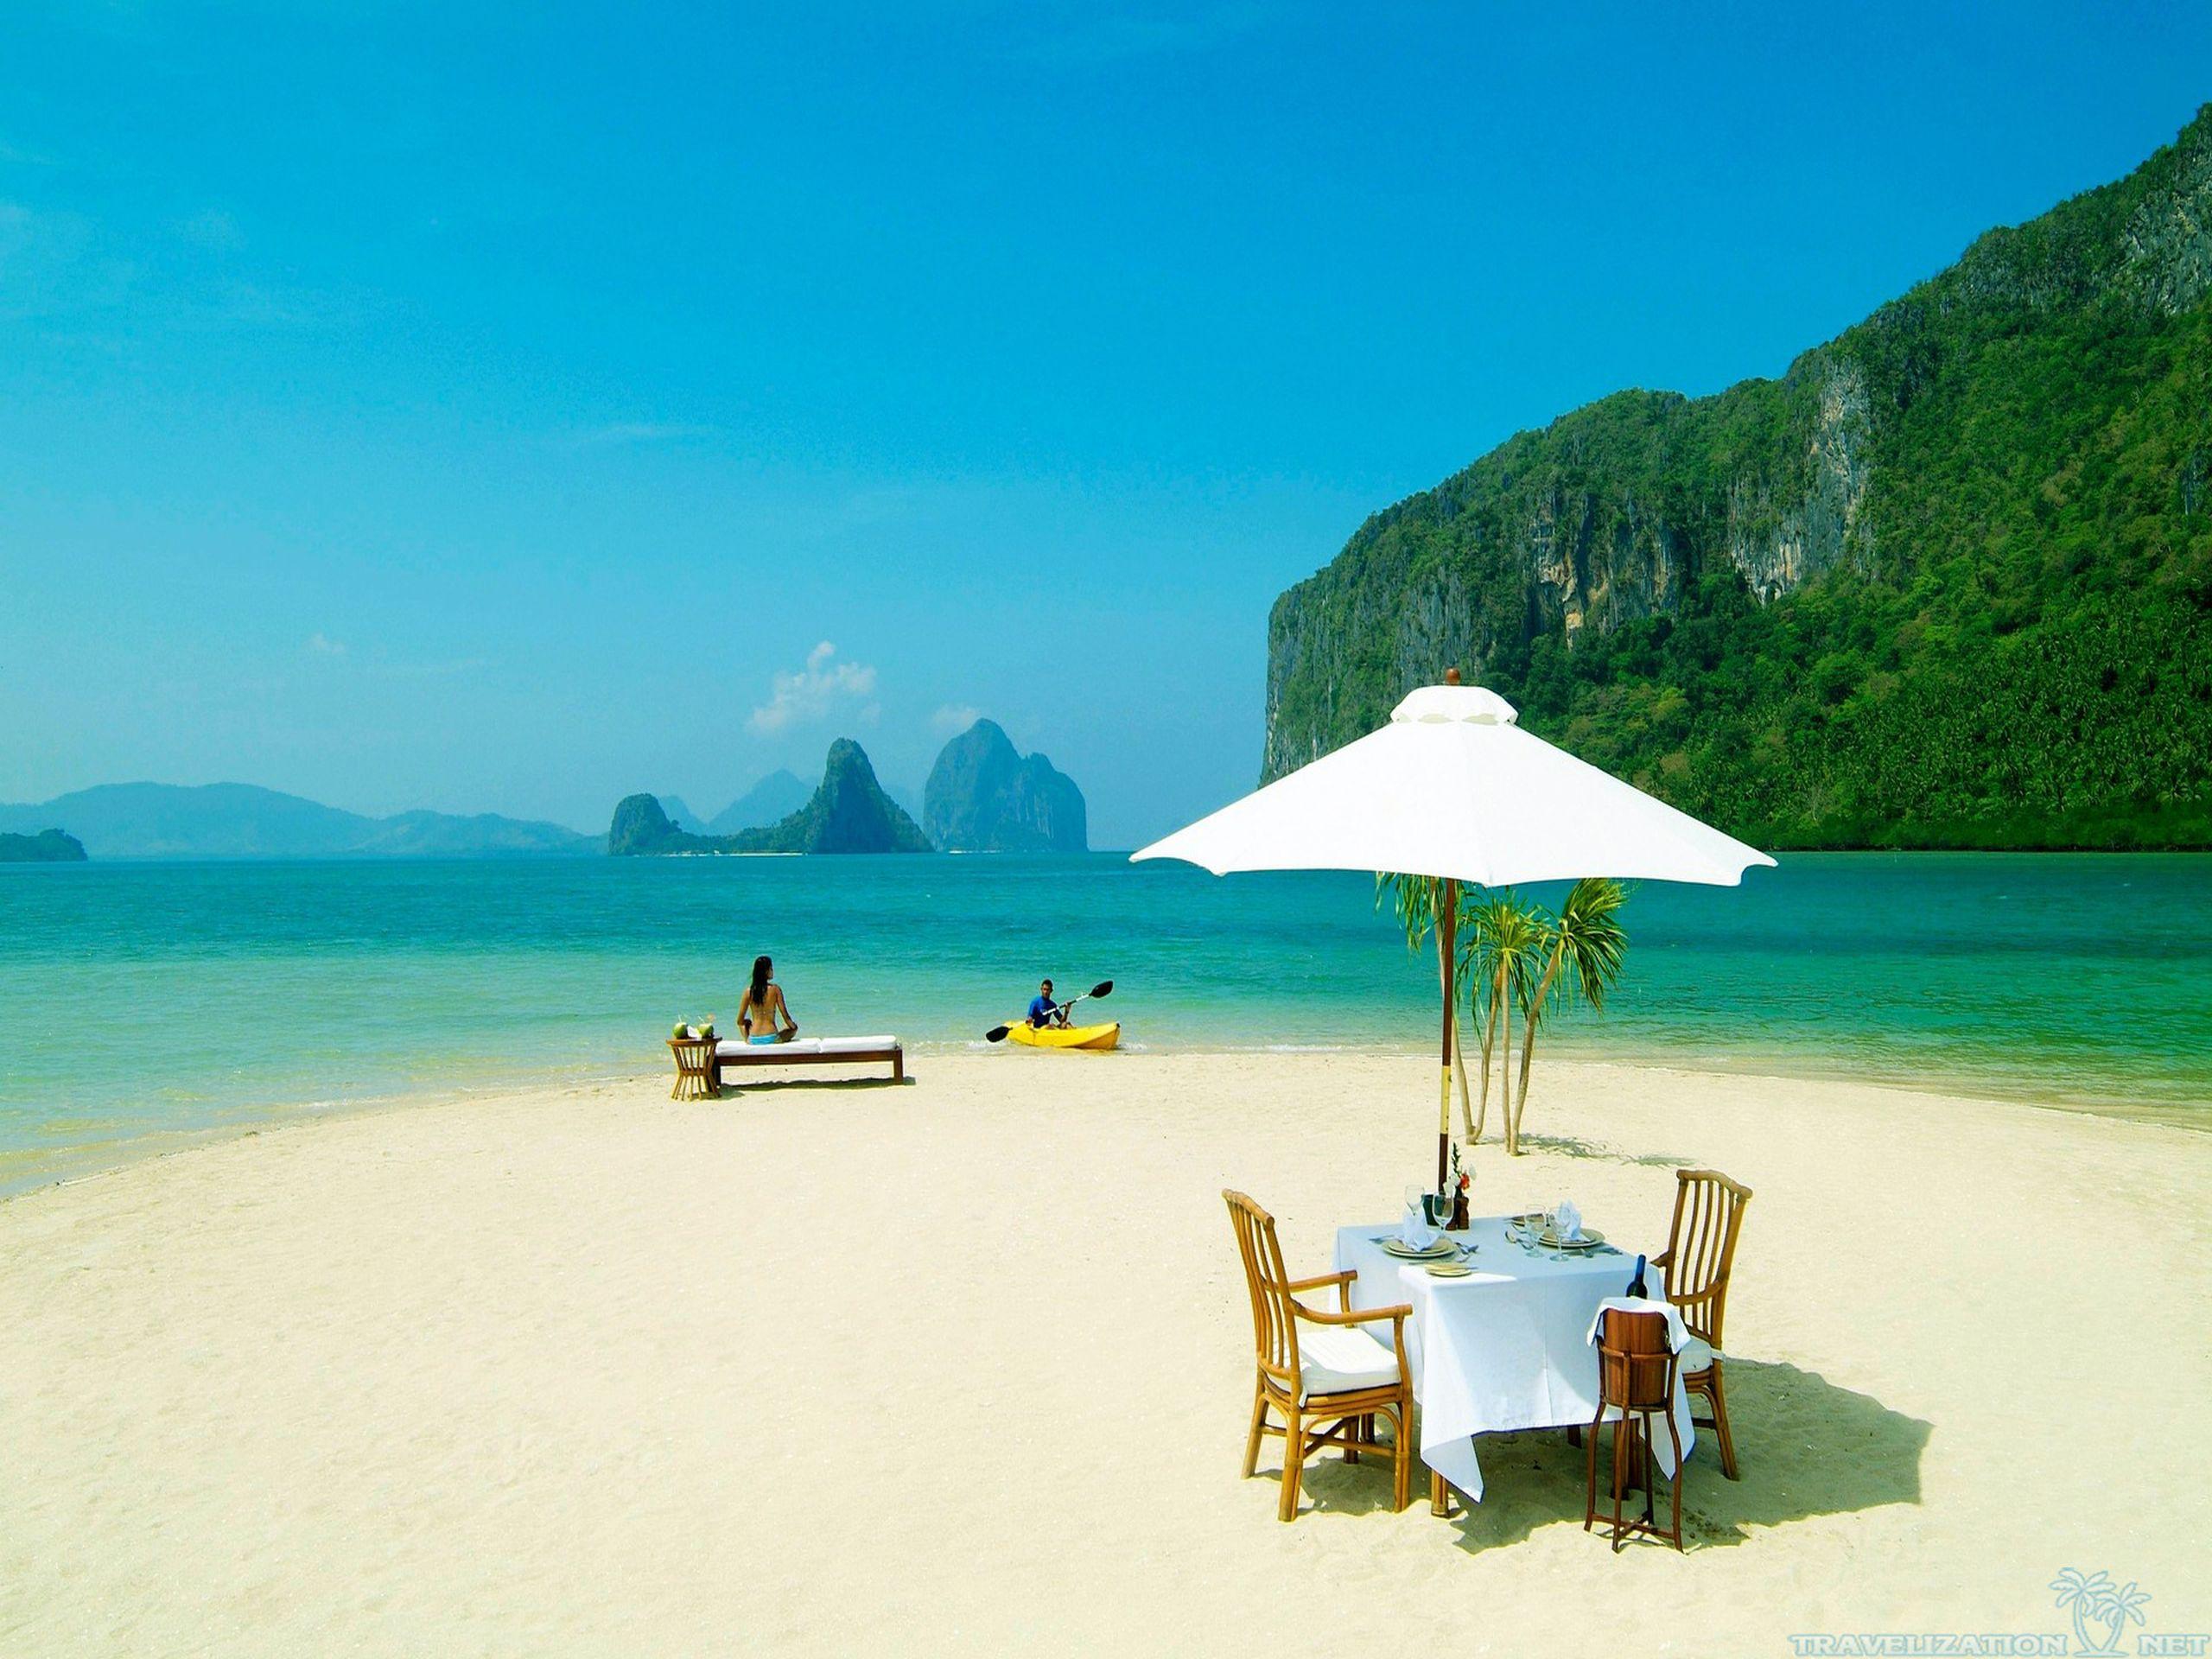 Relaxing Beach Wallpaper - WallpaperSafari Relaxing Beach Background